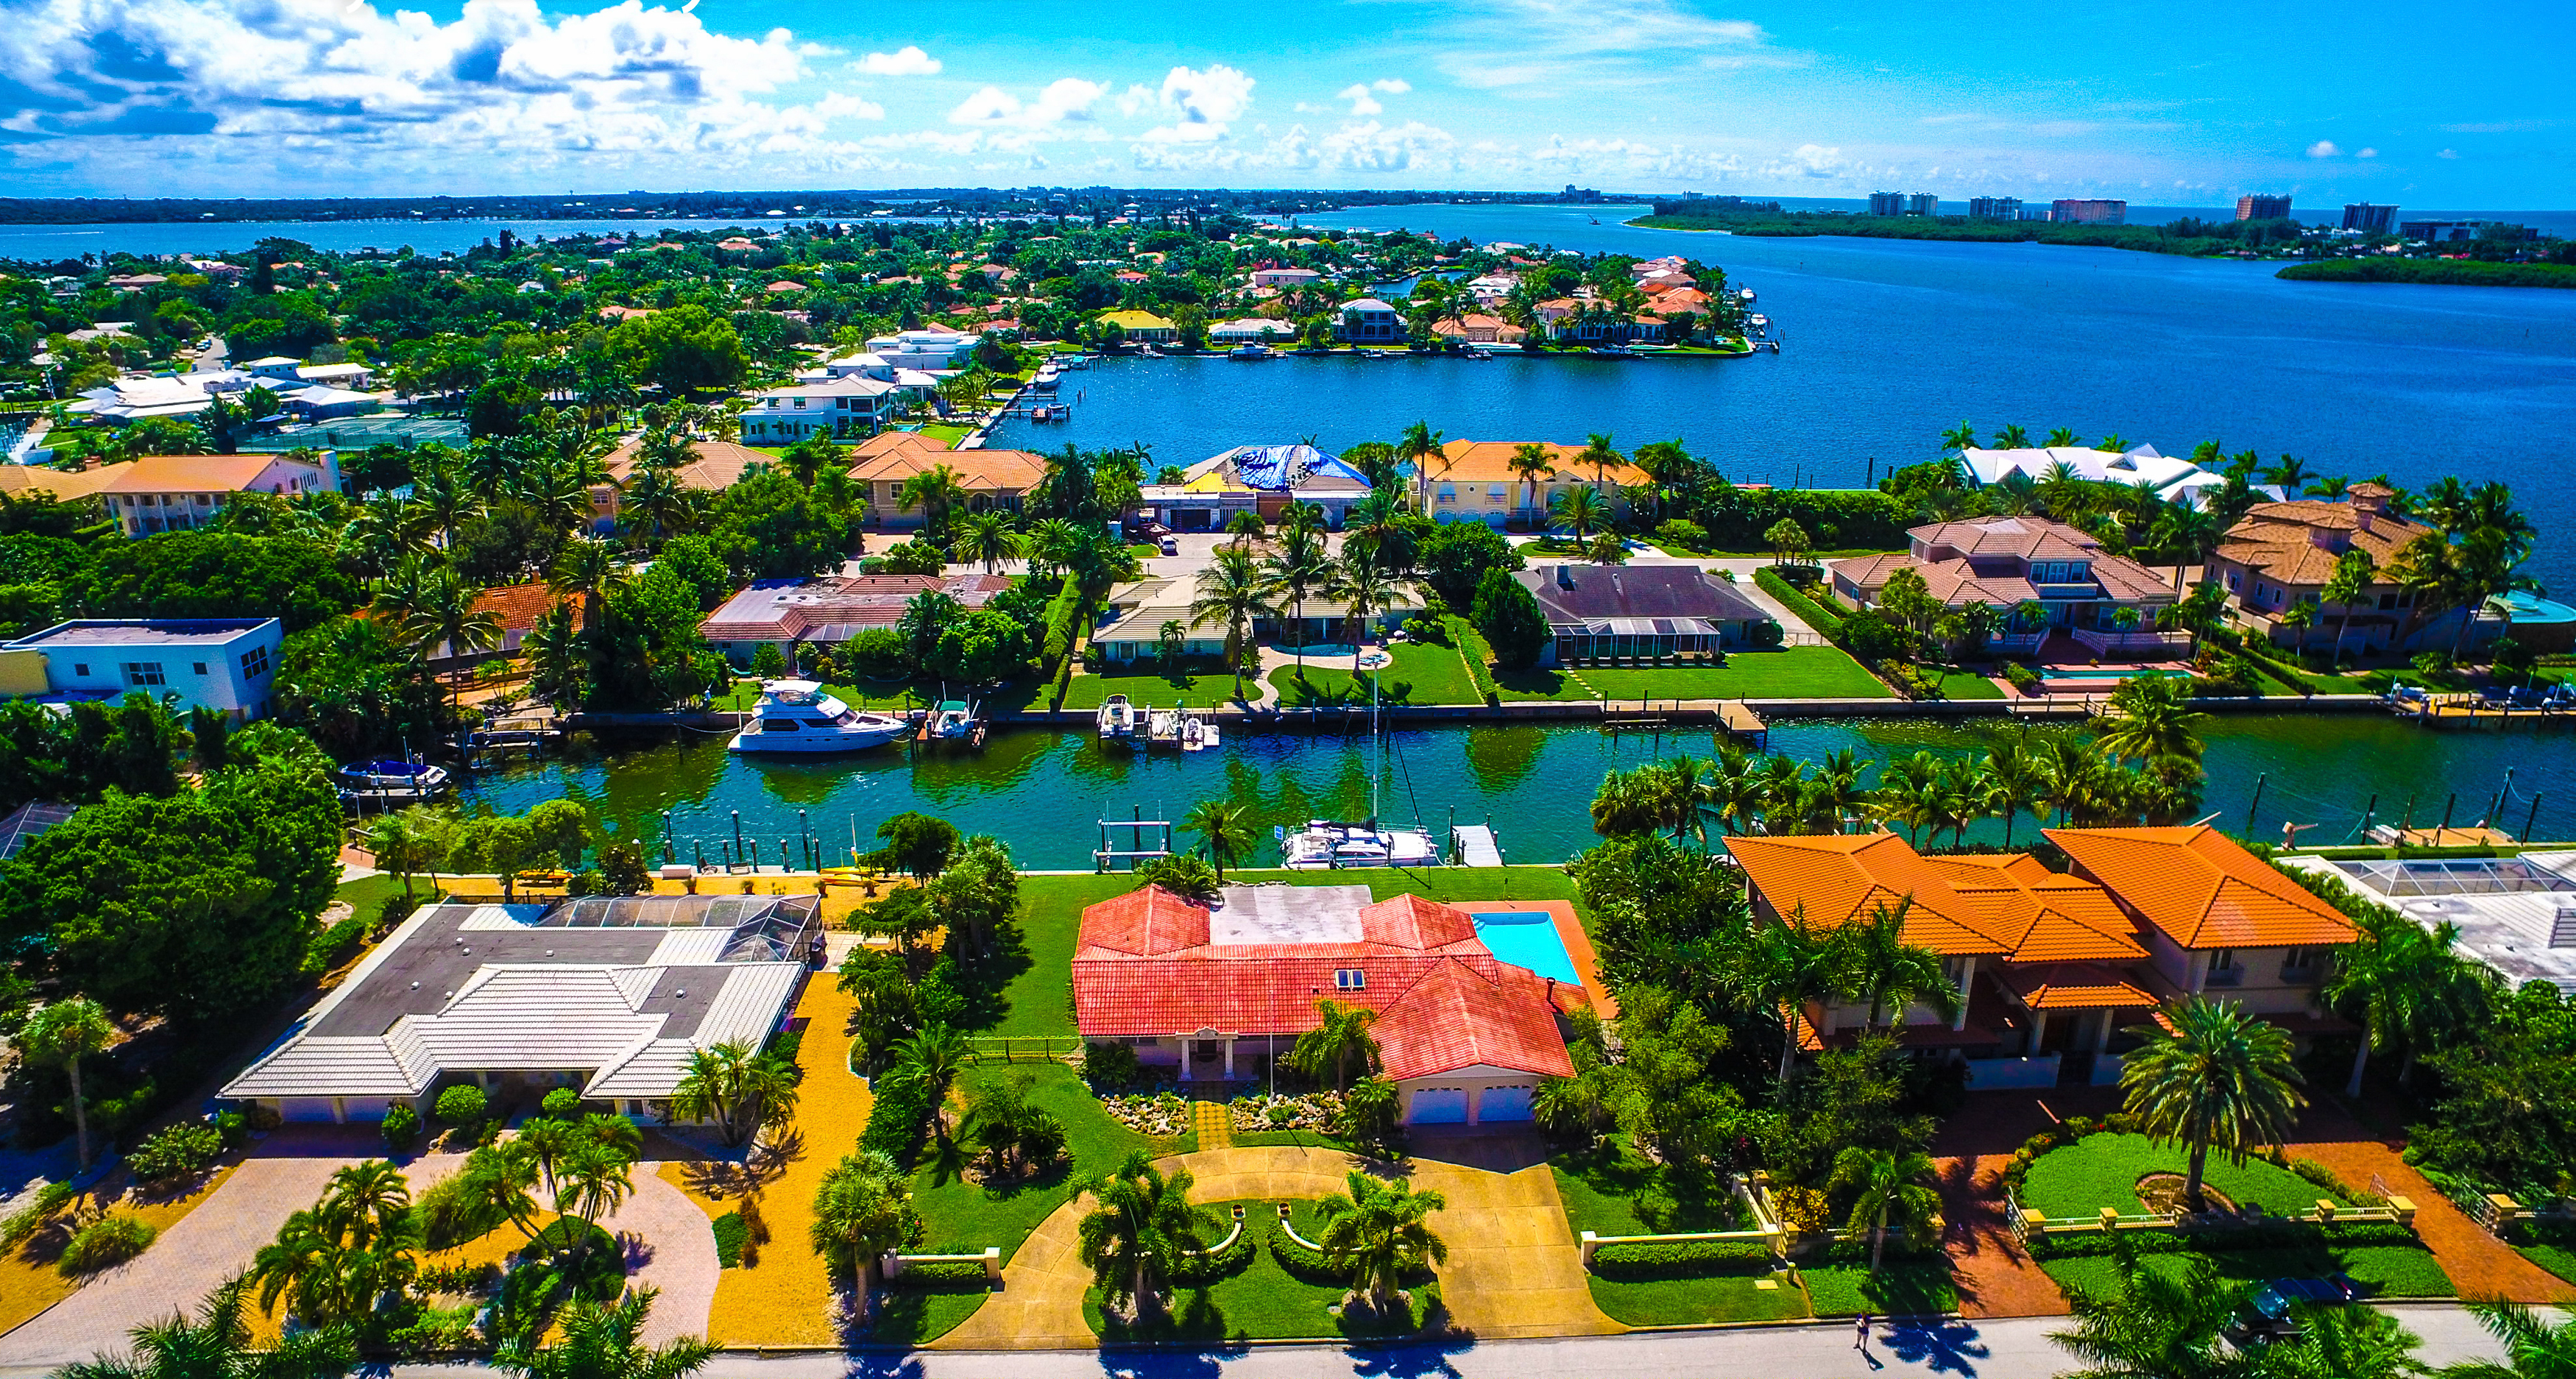 Bird Key Real Estate - Bird Key Homes For Sale - Sarasota, Florida - Map Of Homes For Sale In Florida